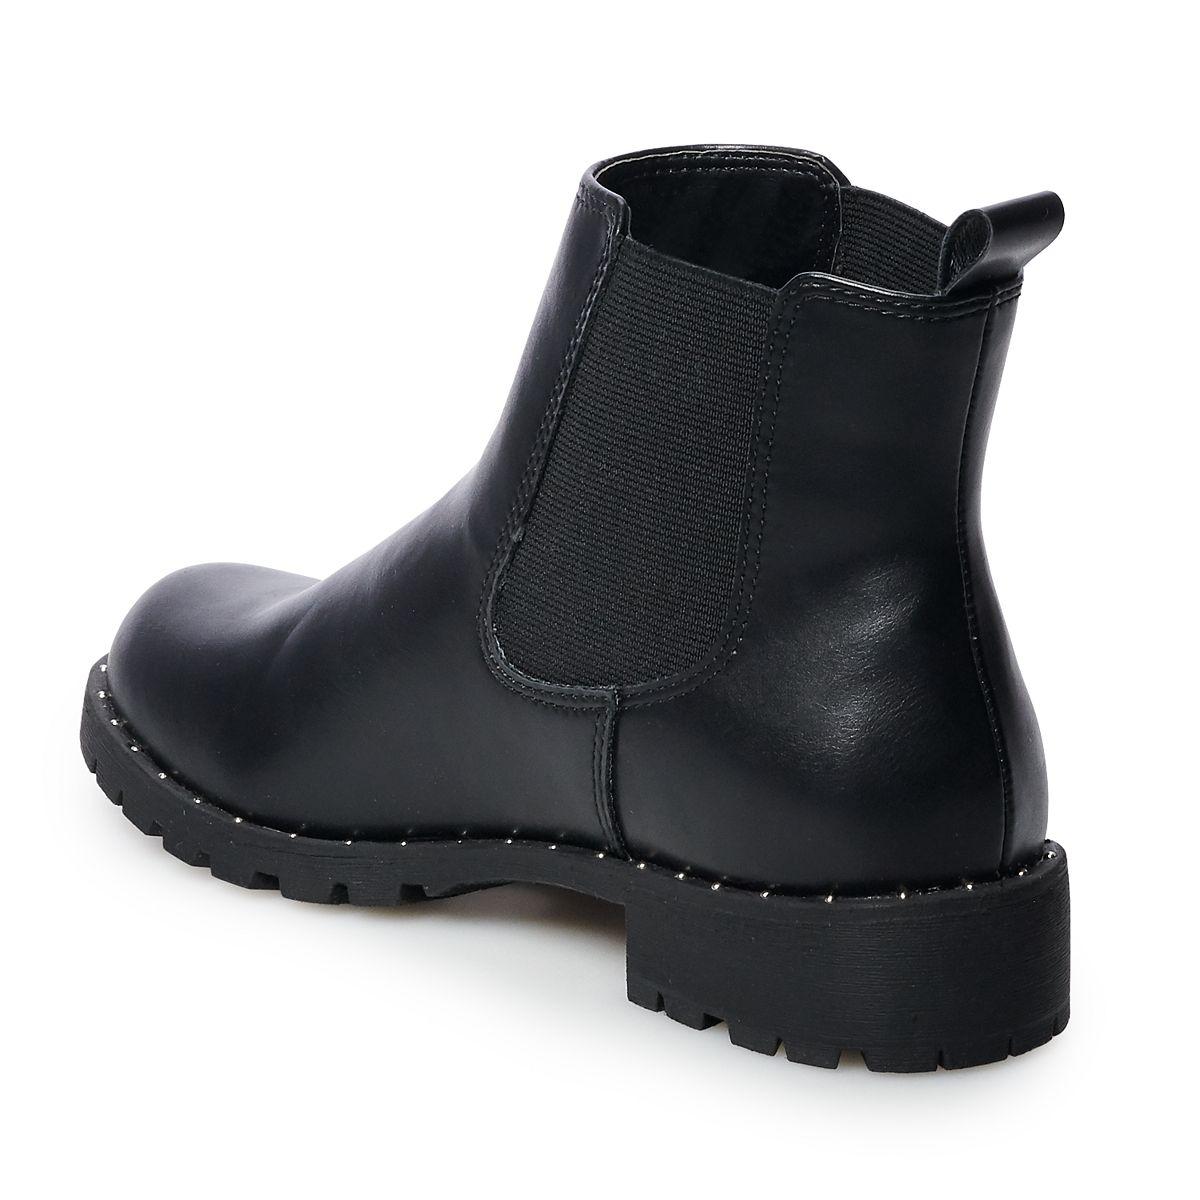 SO® Fabiana Women's Chelsea Ankle Boots YuFLs